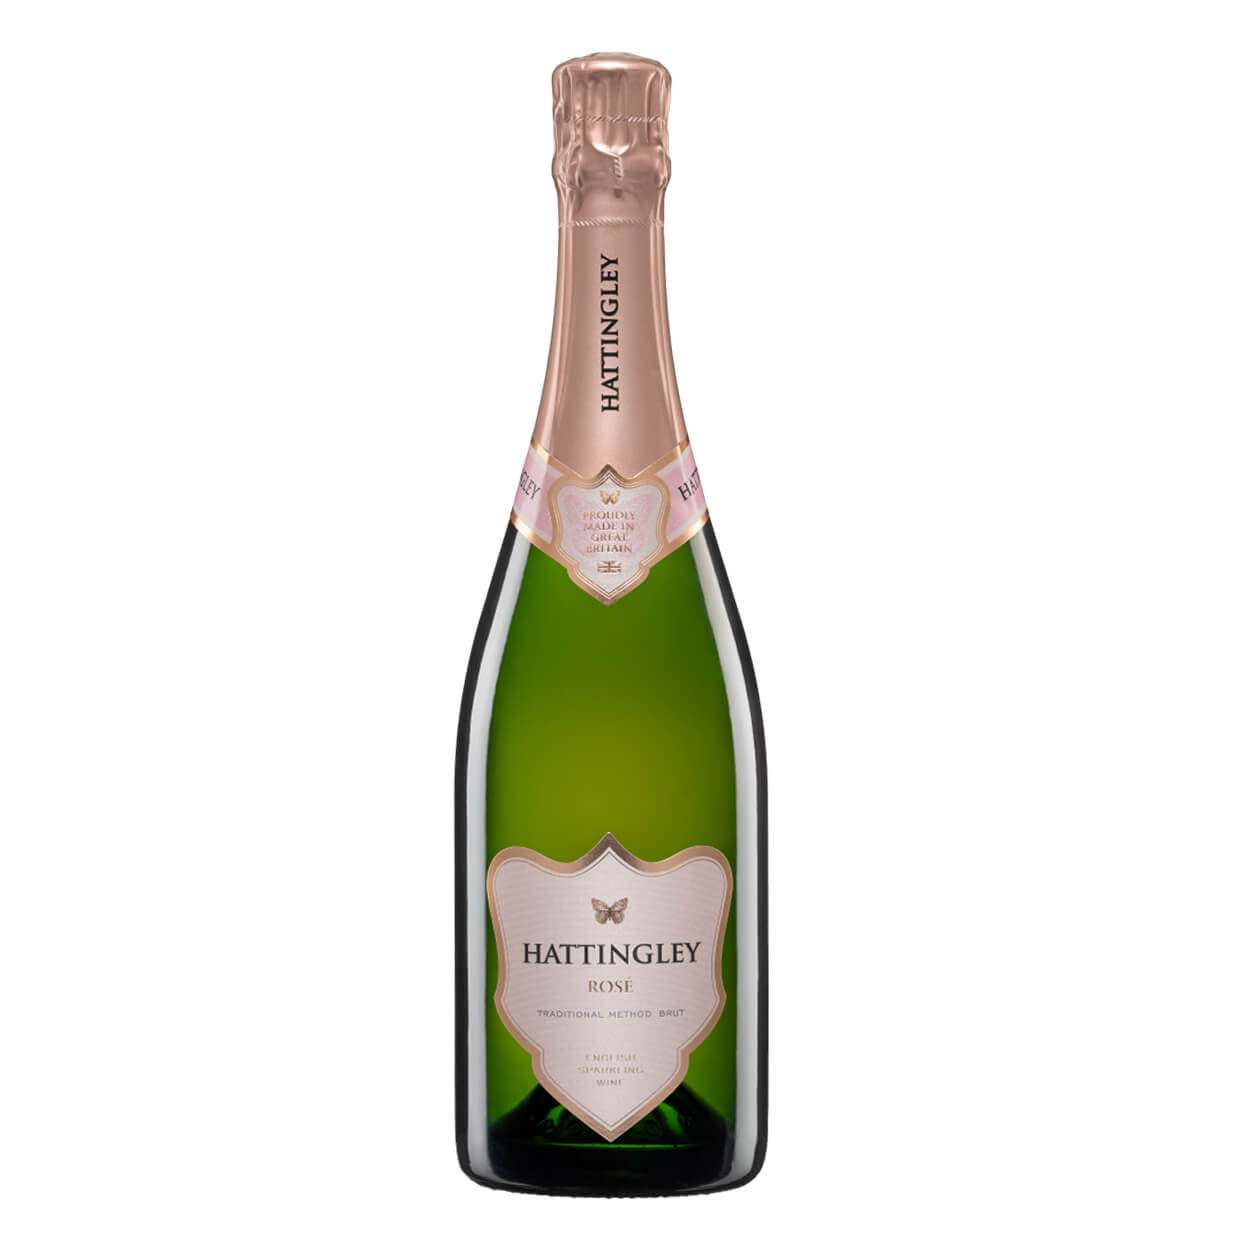 Hattingley Valley Rosé 2018 English Sparkling Wine